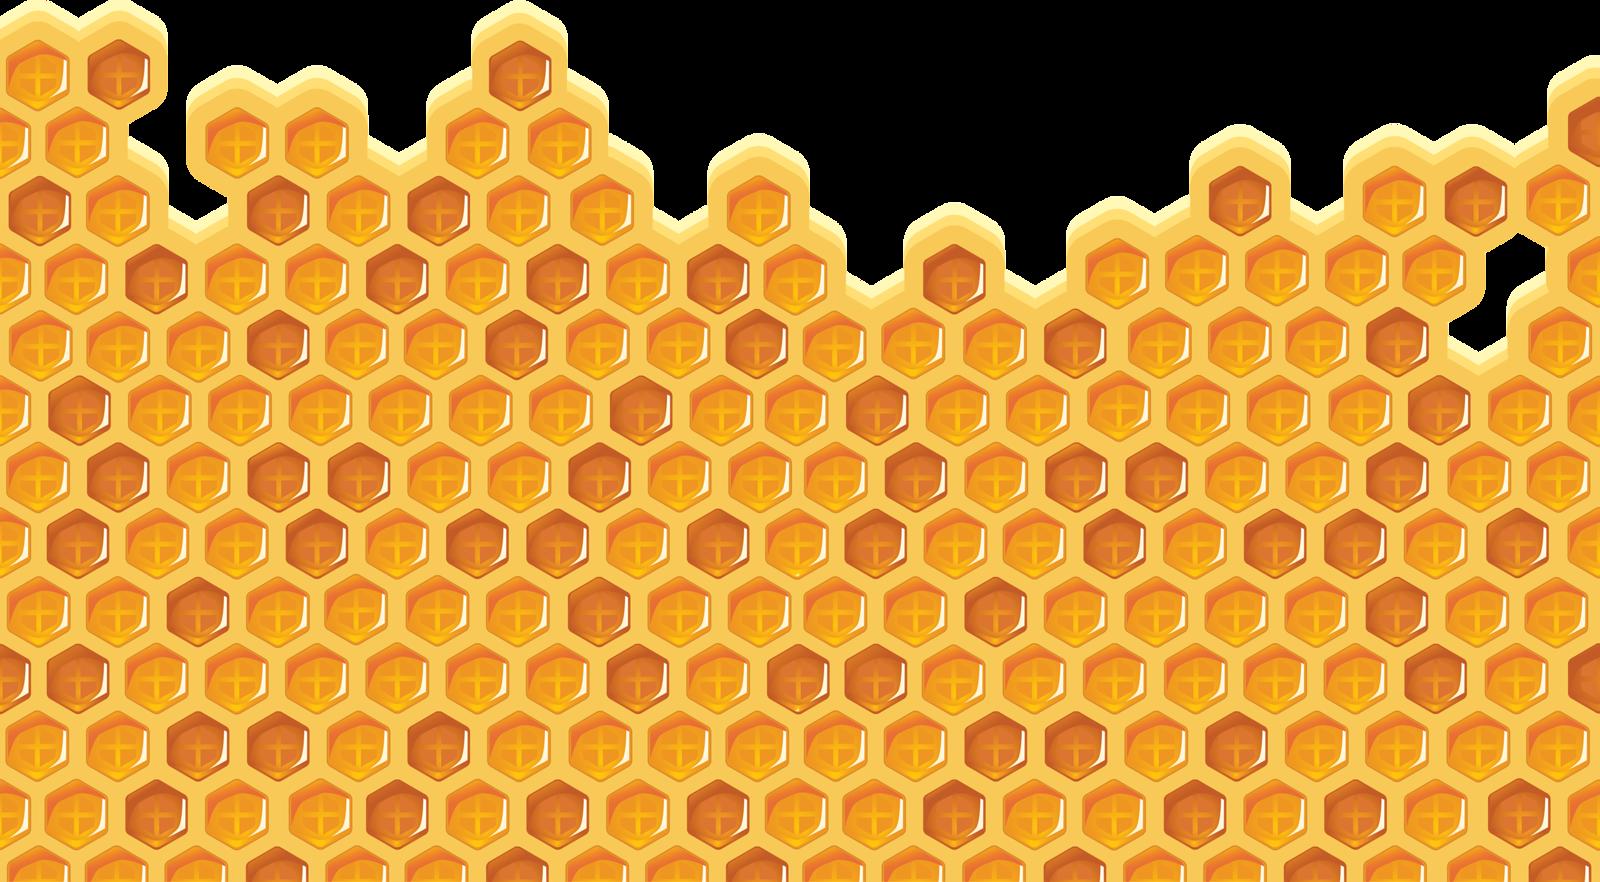 Honeycomb clipart single. Shutterstock png pinterest bees